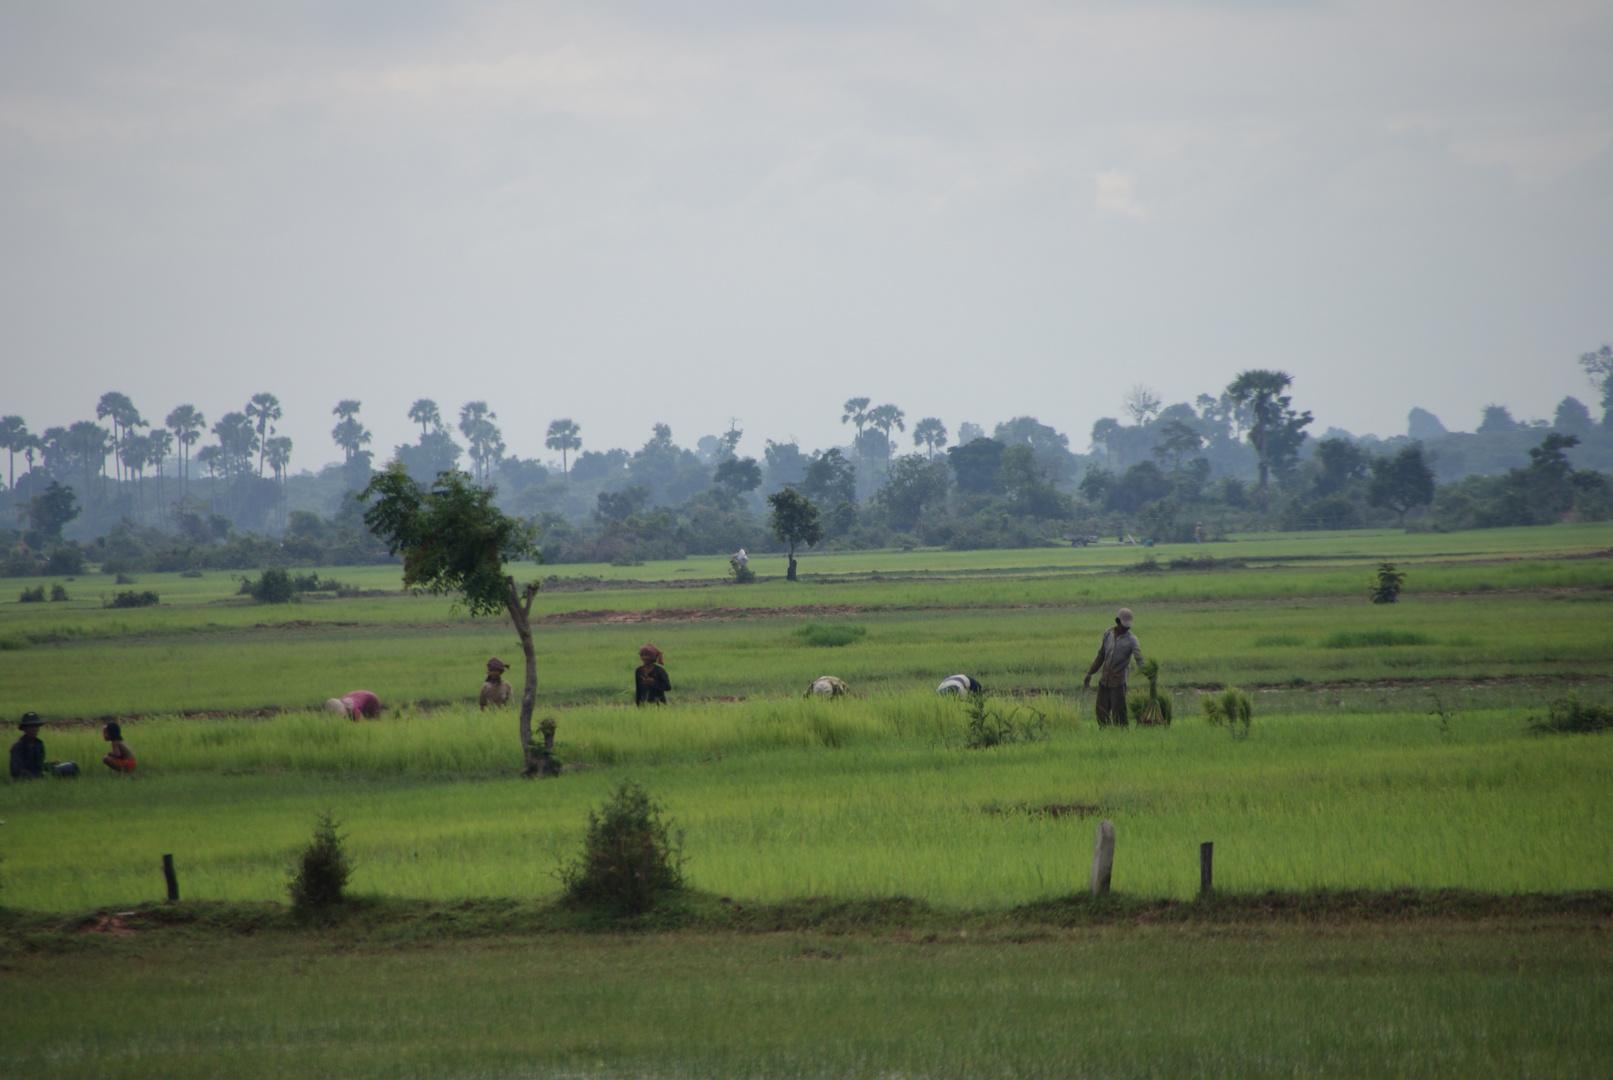 tagwerk im reisfeld, cambodia 2010